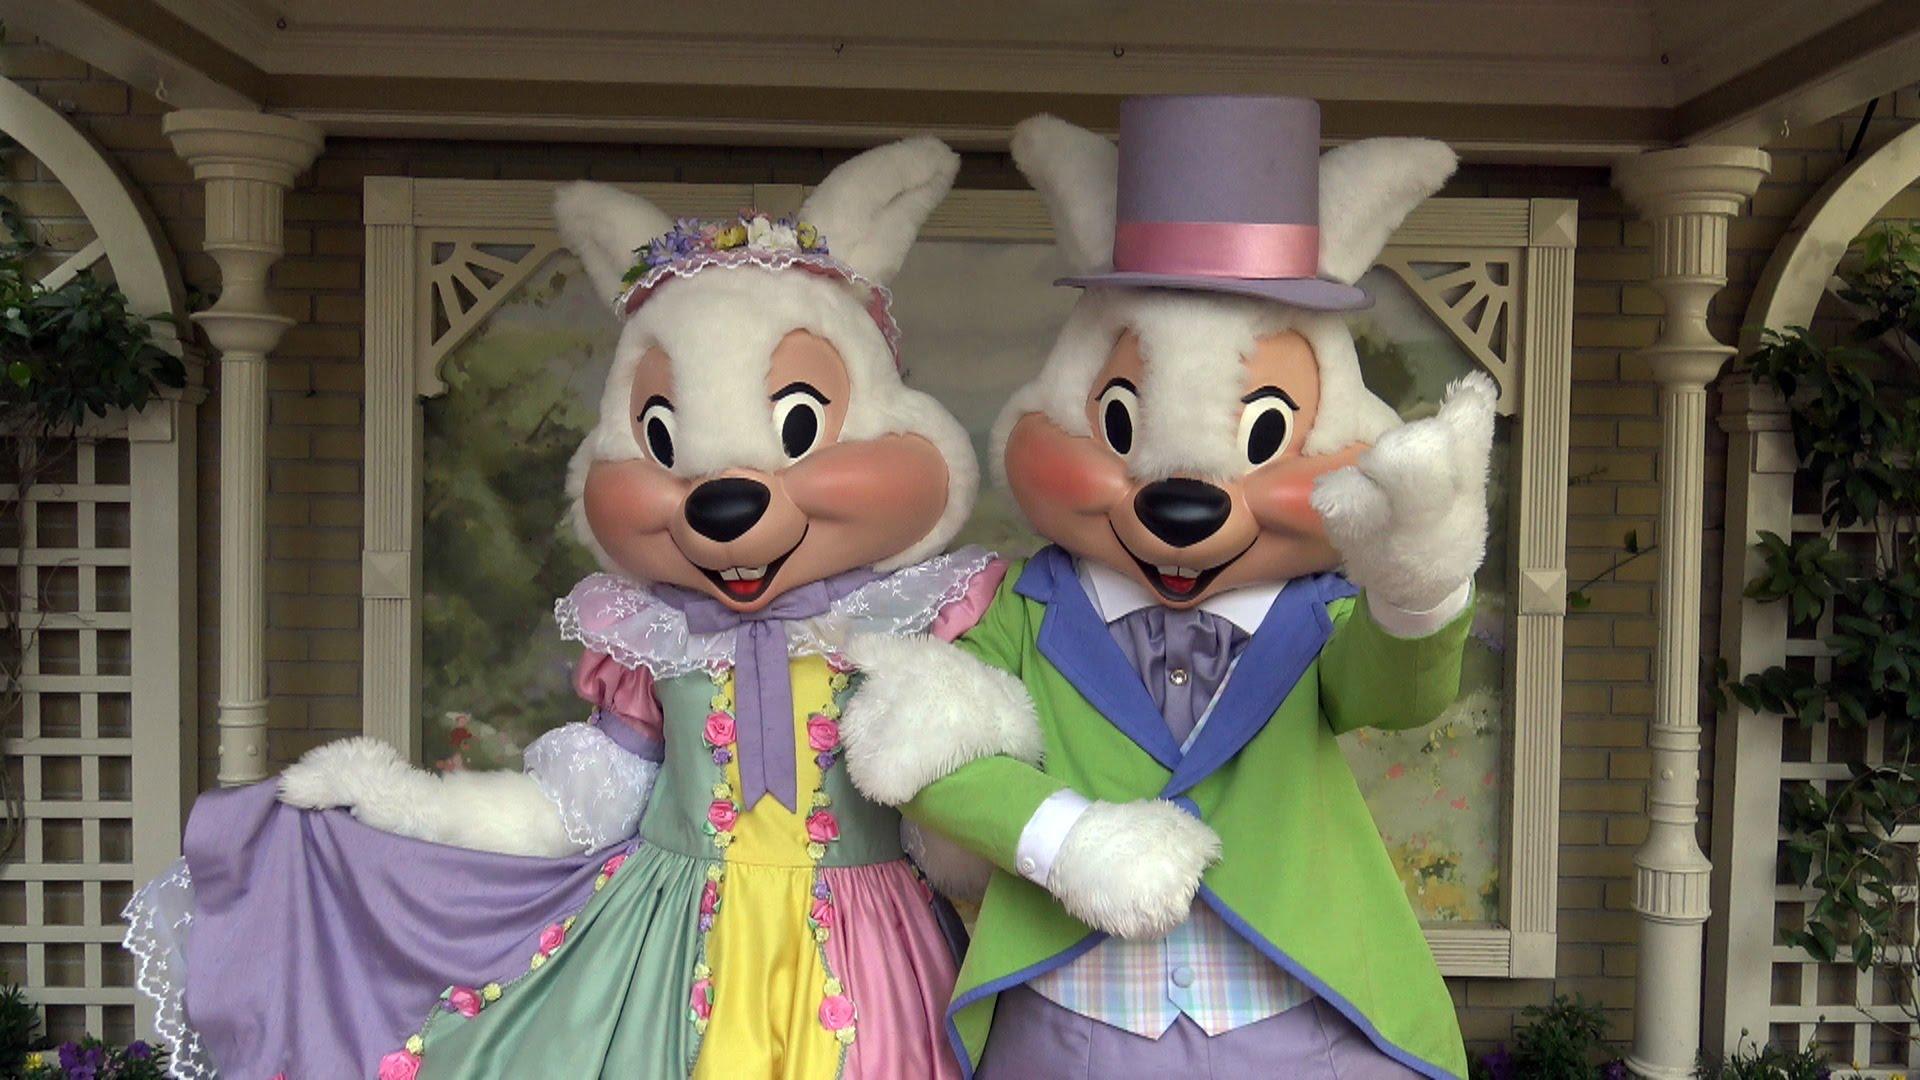 Mr. and Mrs. Easter Bunny in the Magic Kingdom | Walt Disney World